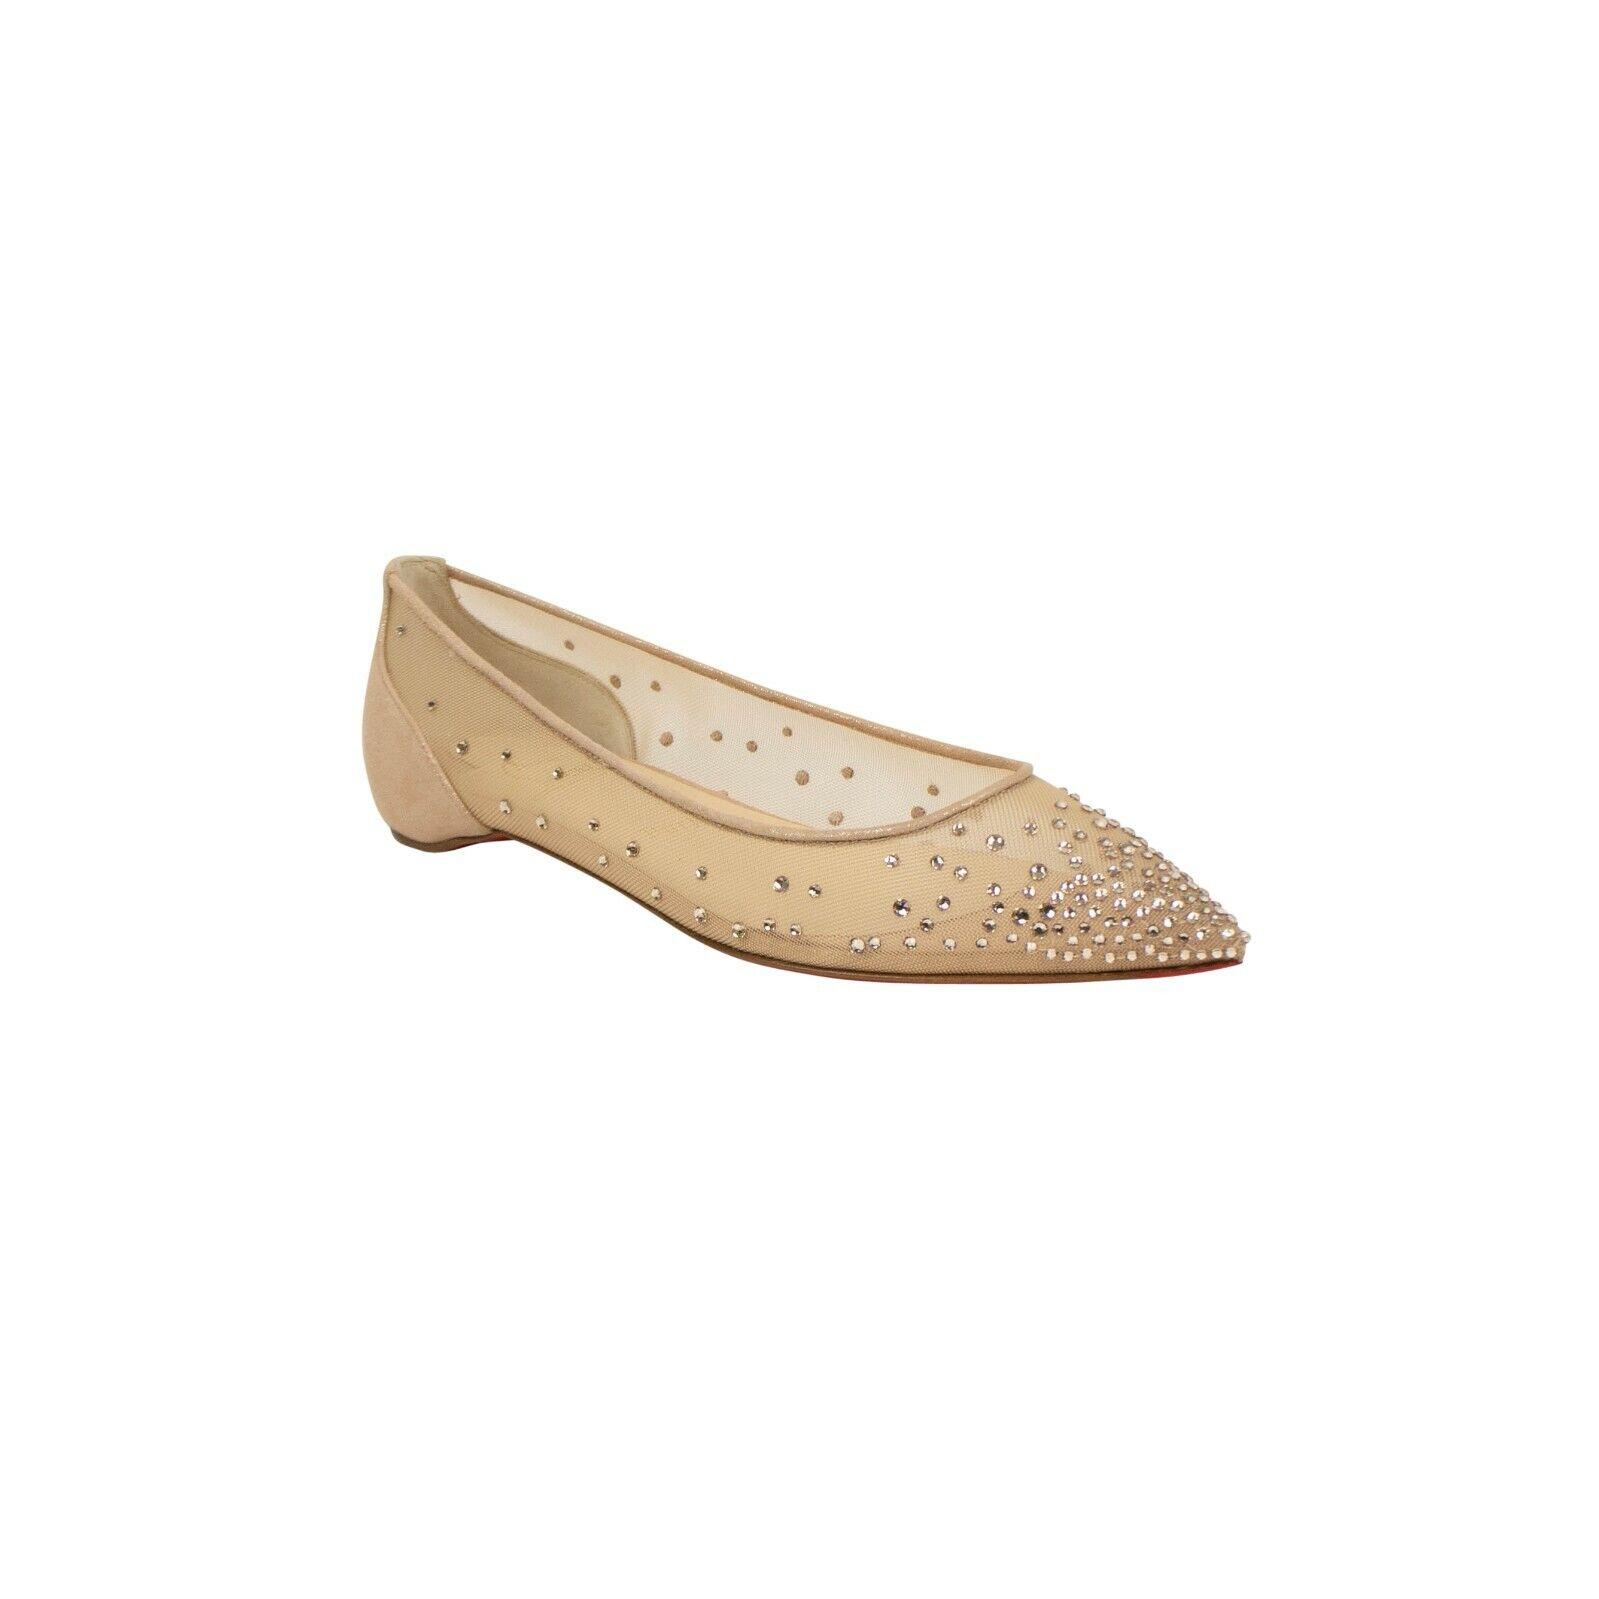 Nuevo En Caja Christian Louboutin Beige 'Follies Strass's Flats zapatos 5 35  995